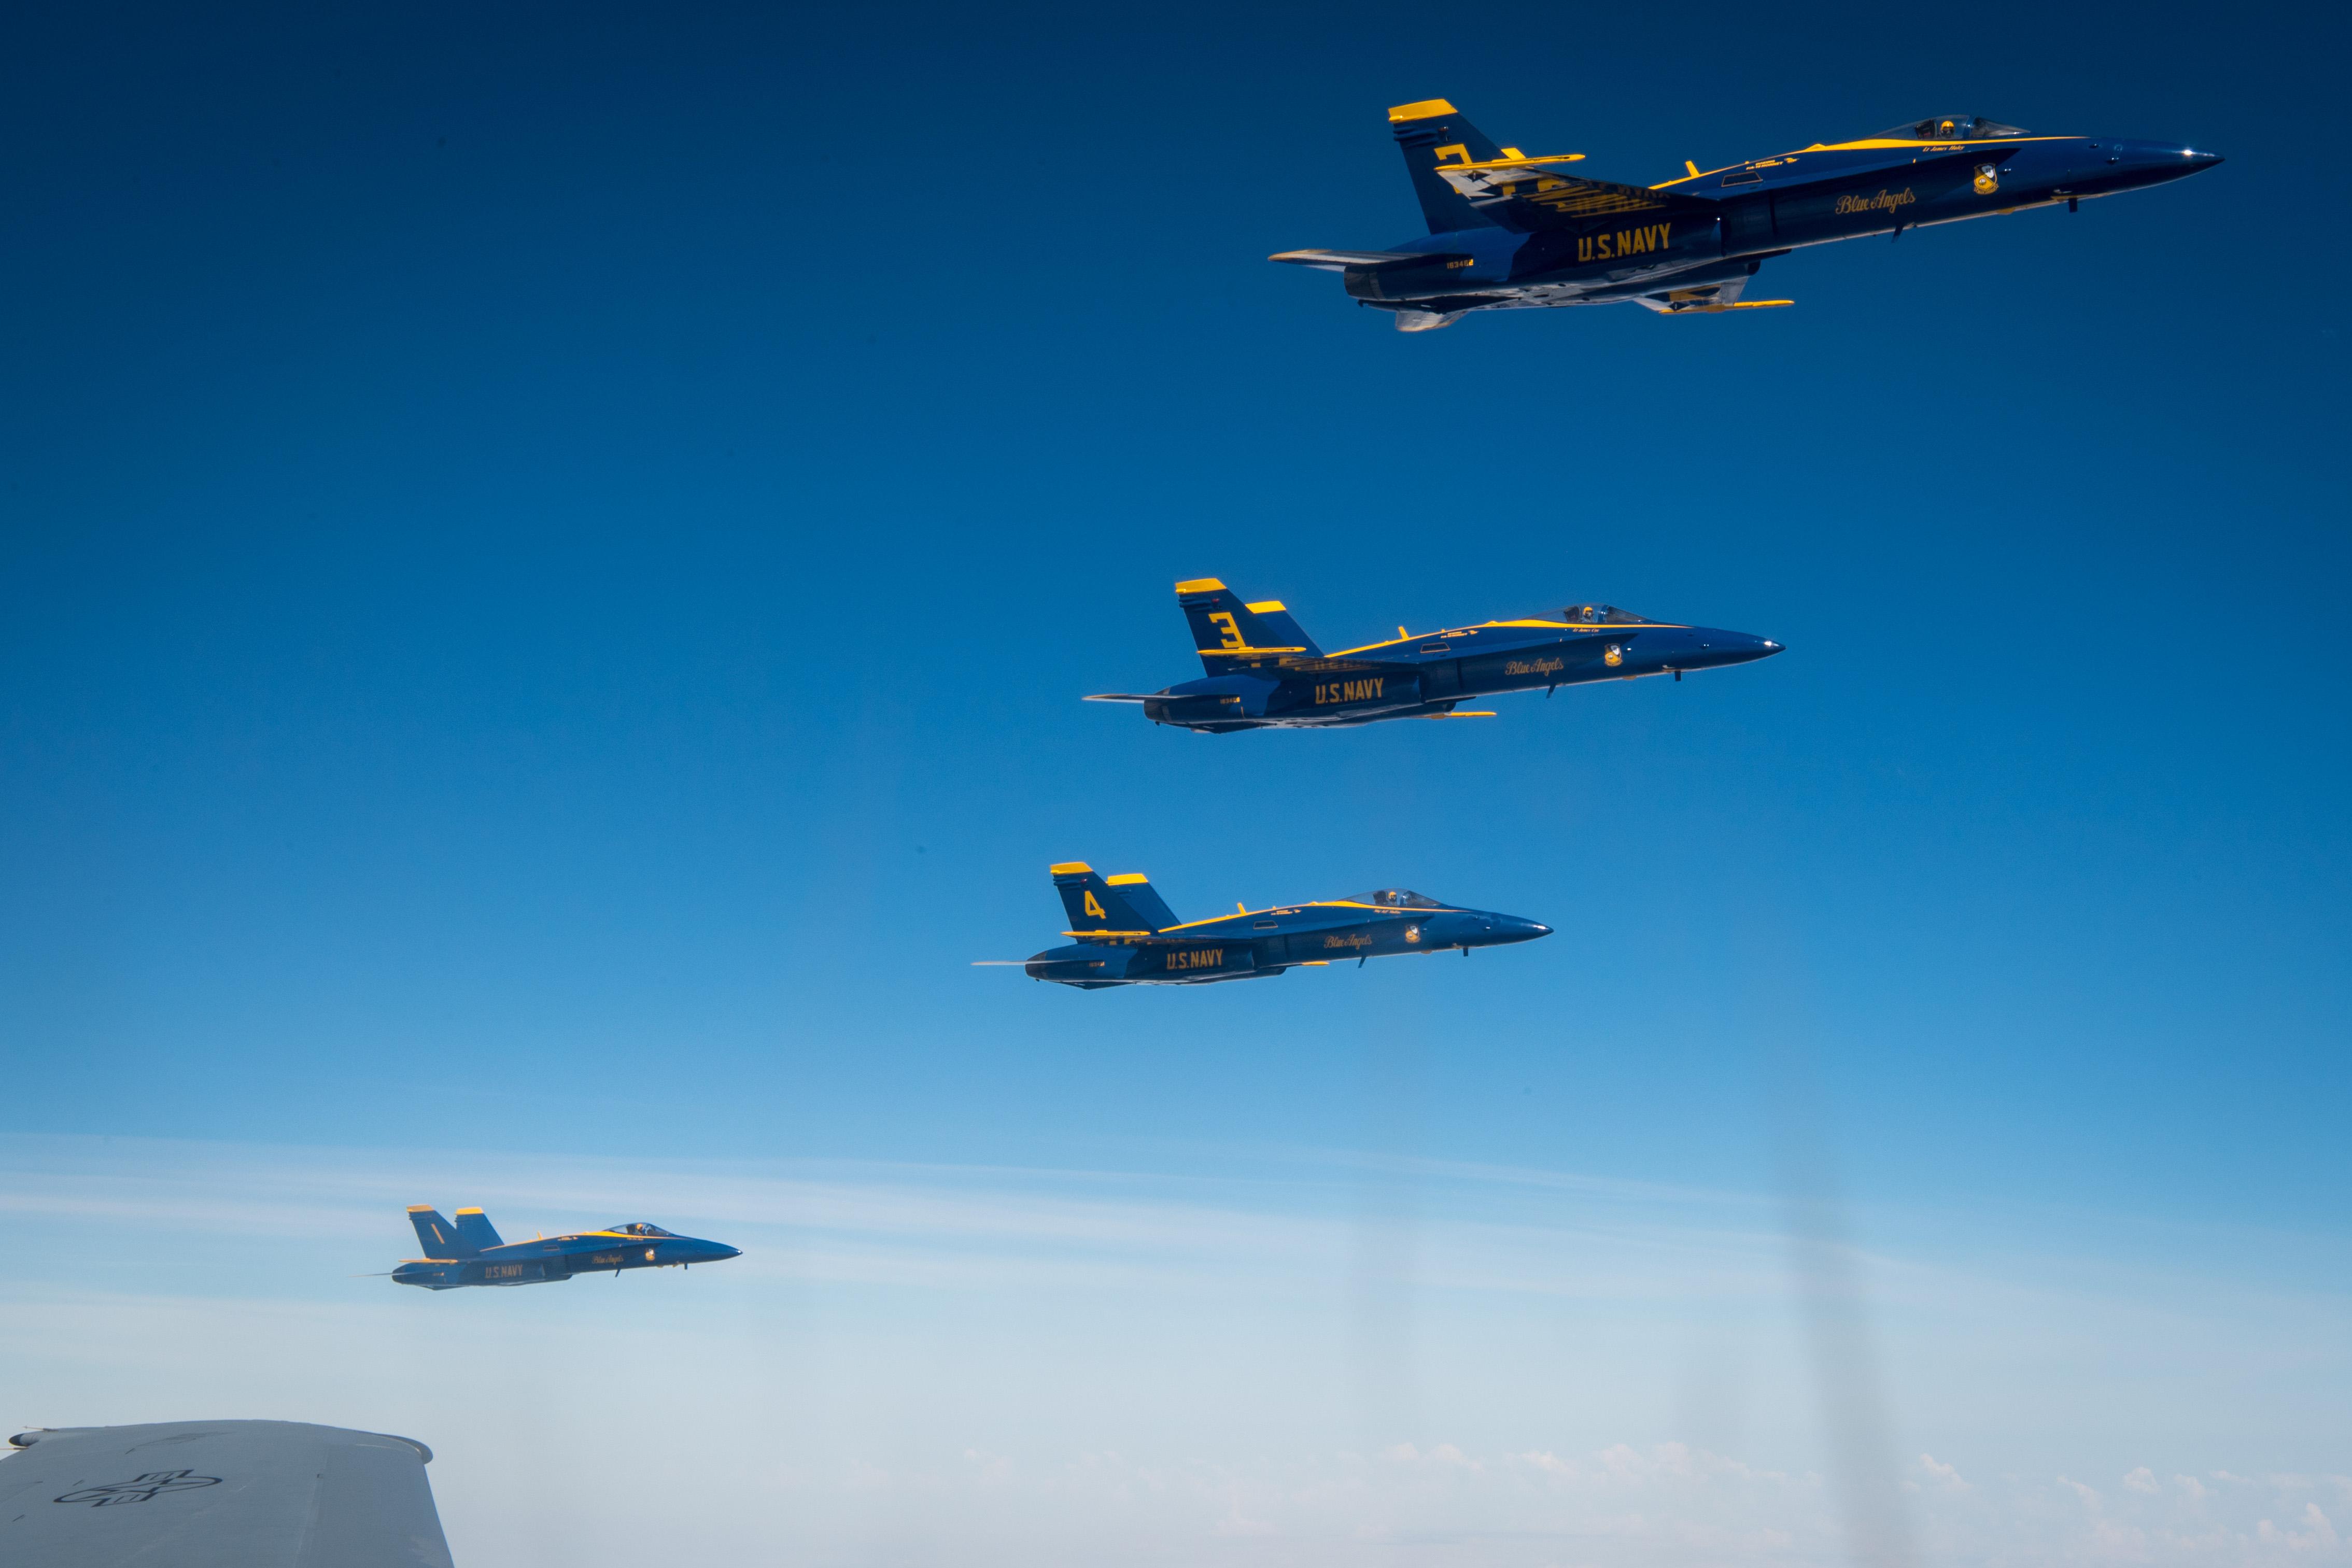 The U.S. Navy Flight Demonstration Squadron, the Blue